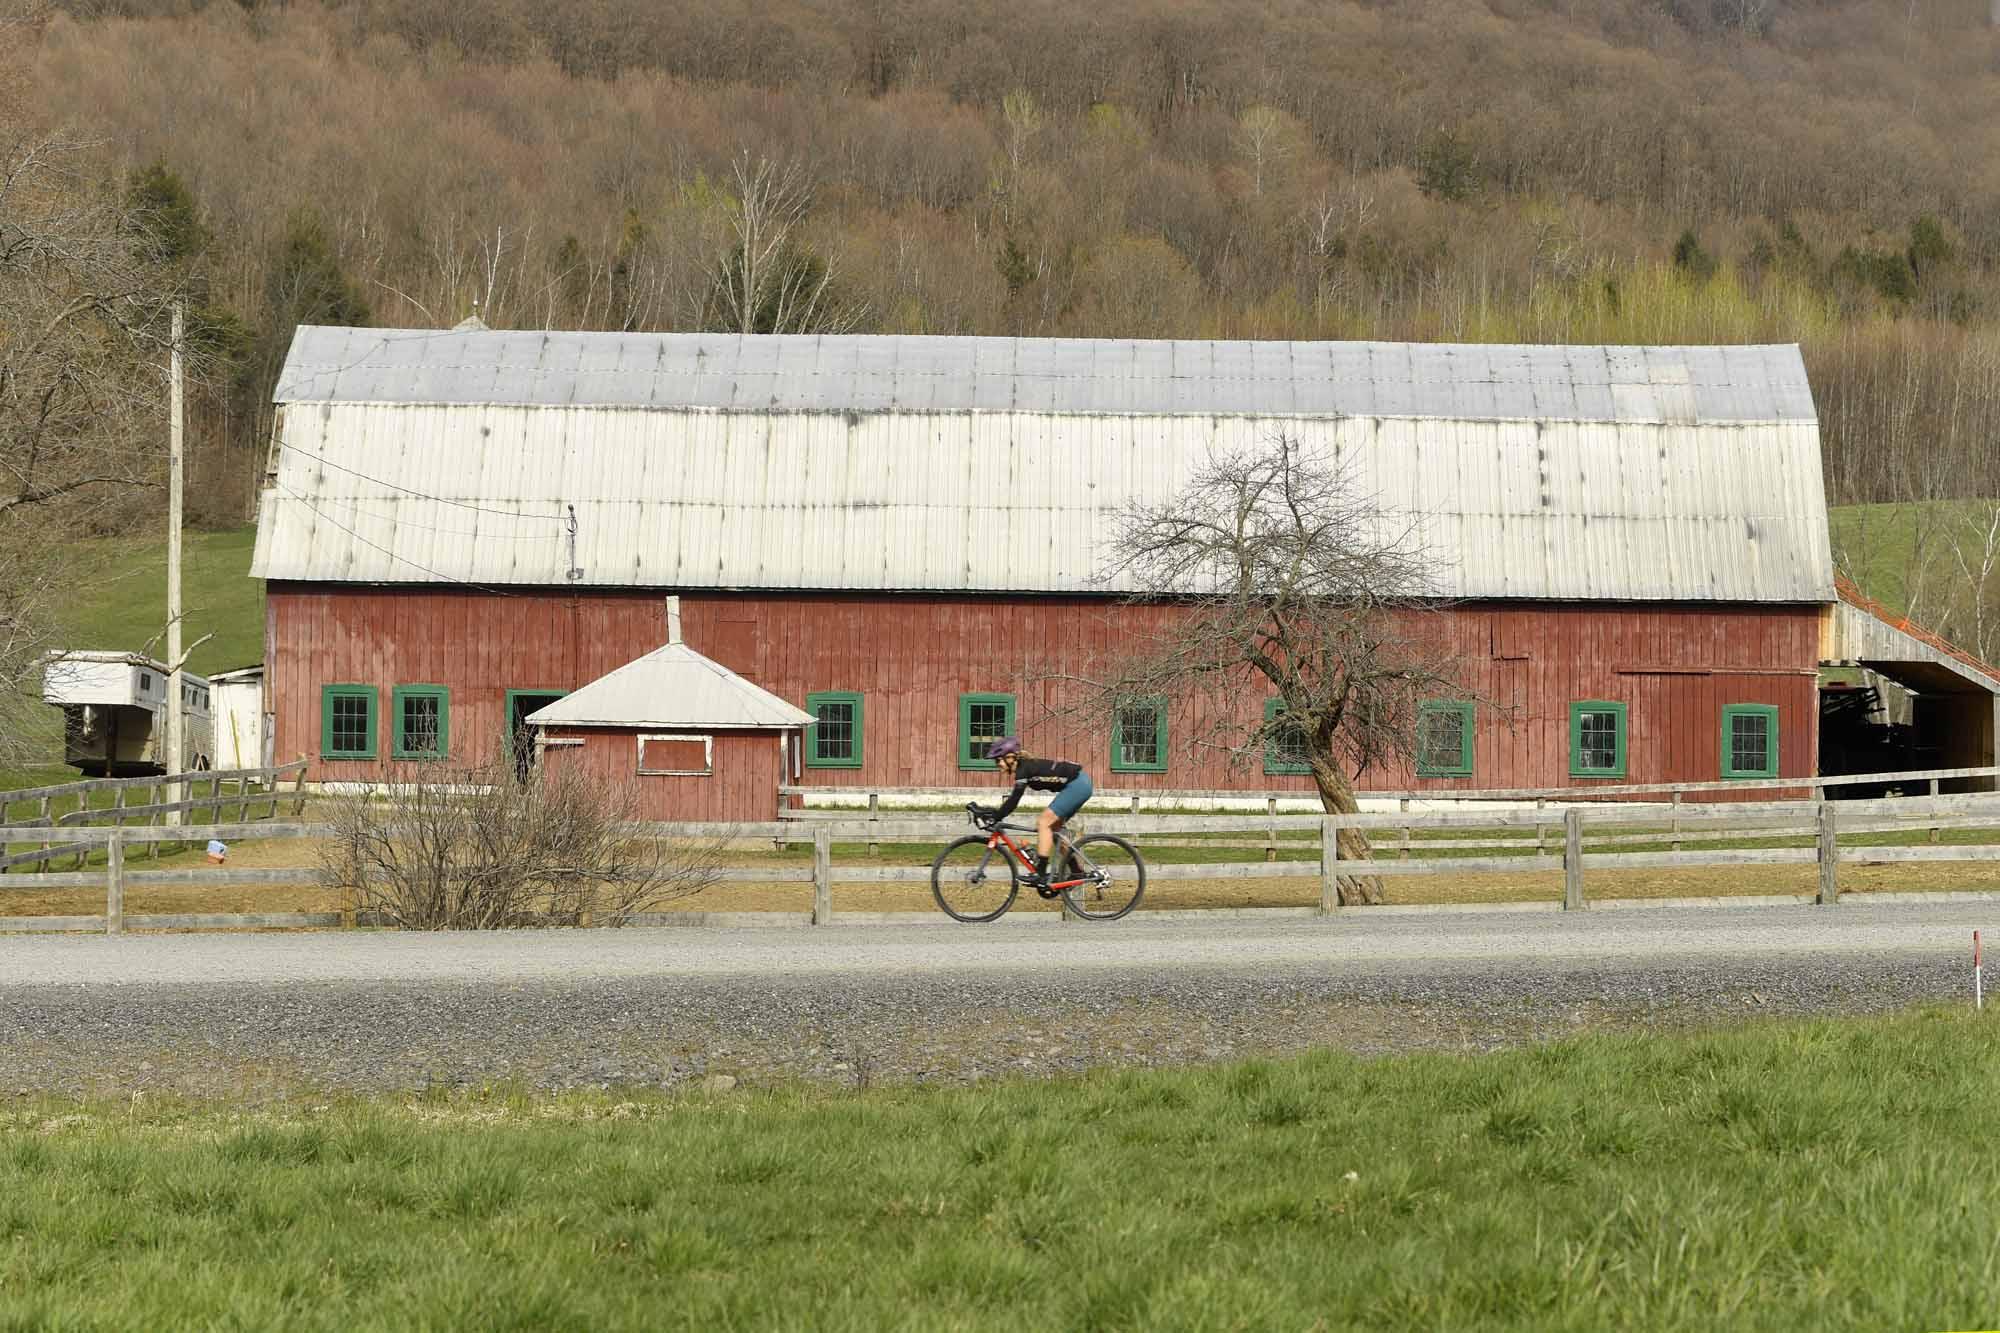 Gravel-Bandits-Gang-de-la-Garnotte-Bromont-Cyclists-Shun-Pavement-Bernard-Brault-red-barn